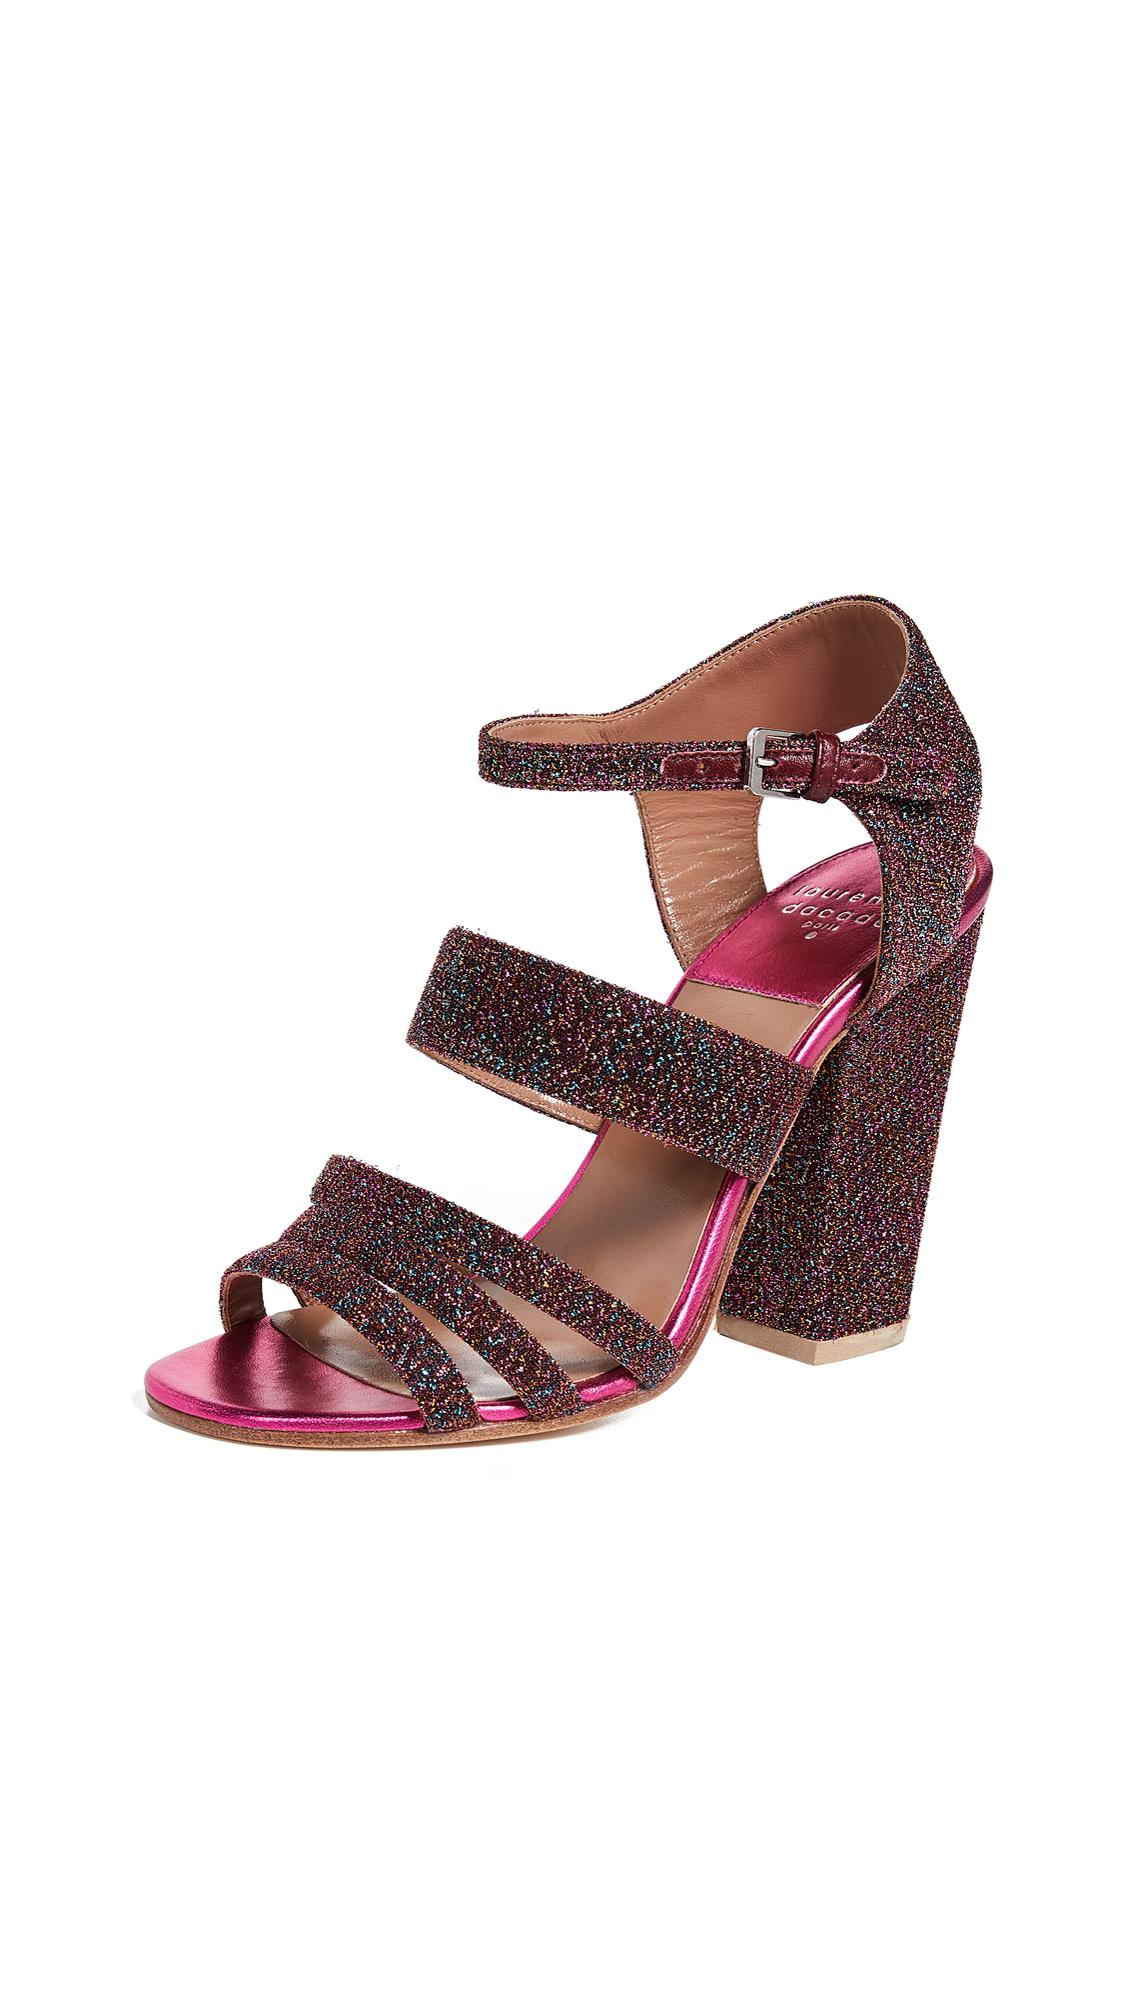 Laurence Dacade Ninon Sandals - Fuchsia